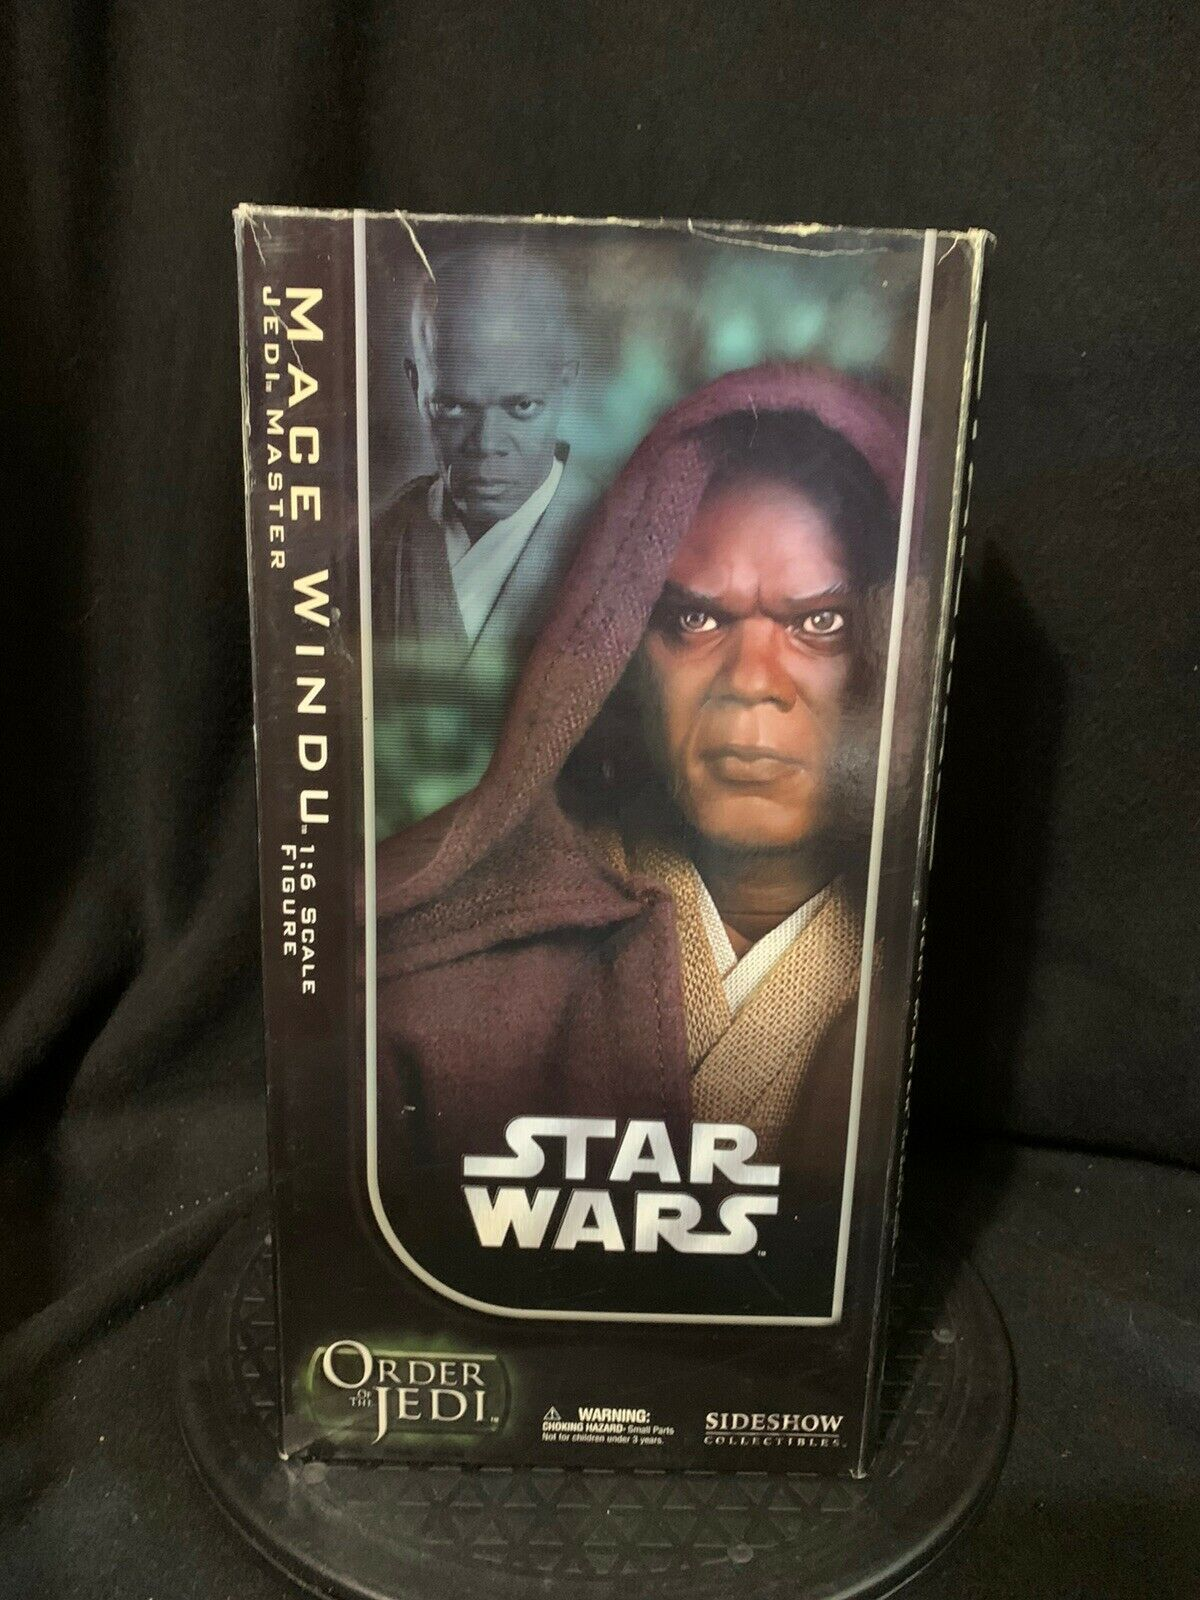 Sideshow Star Wars 1 6th Scale Mace Windu Jedi Master Order of the Jedi